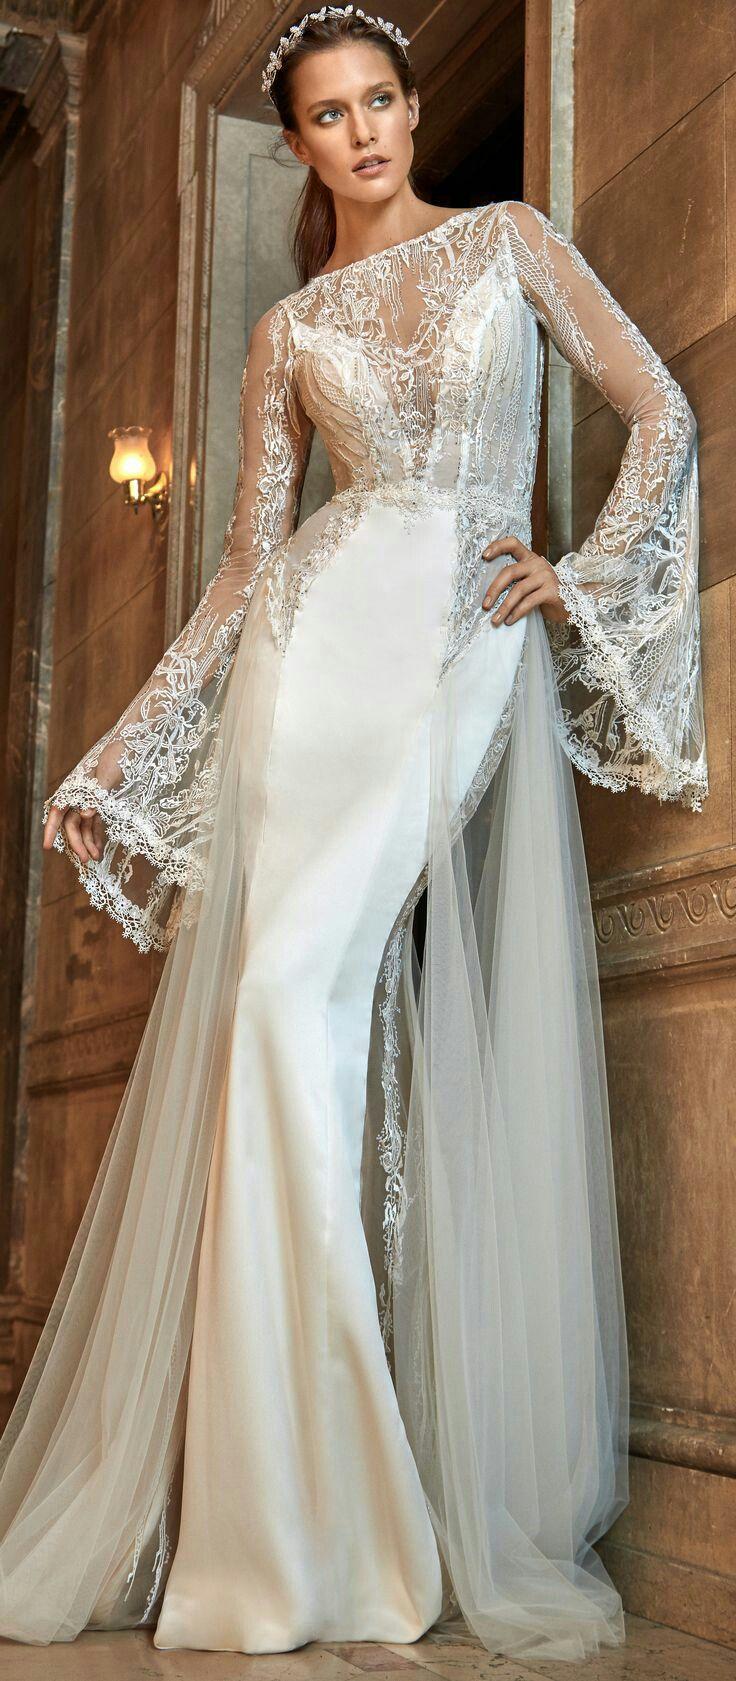 Elegant gown from galia lahav le secret royal part ii wedding dress